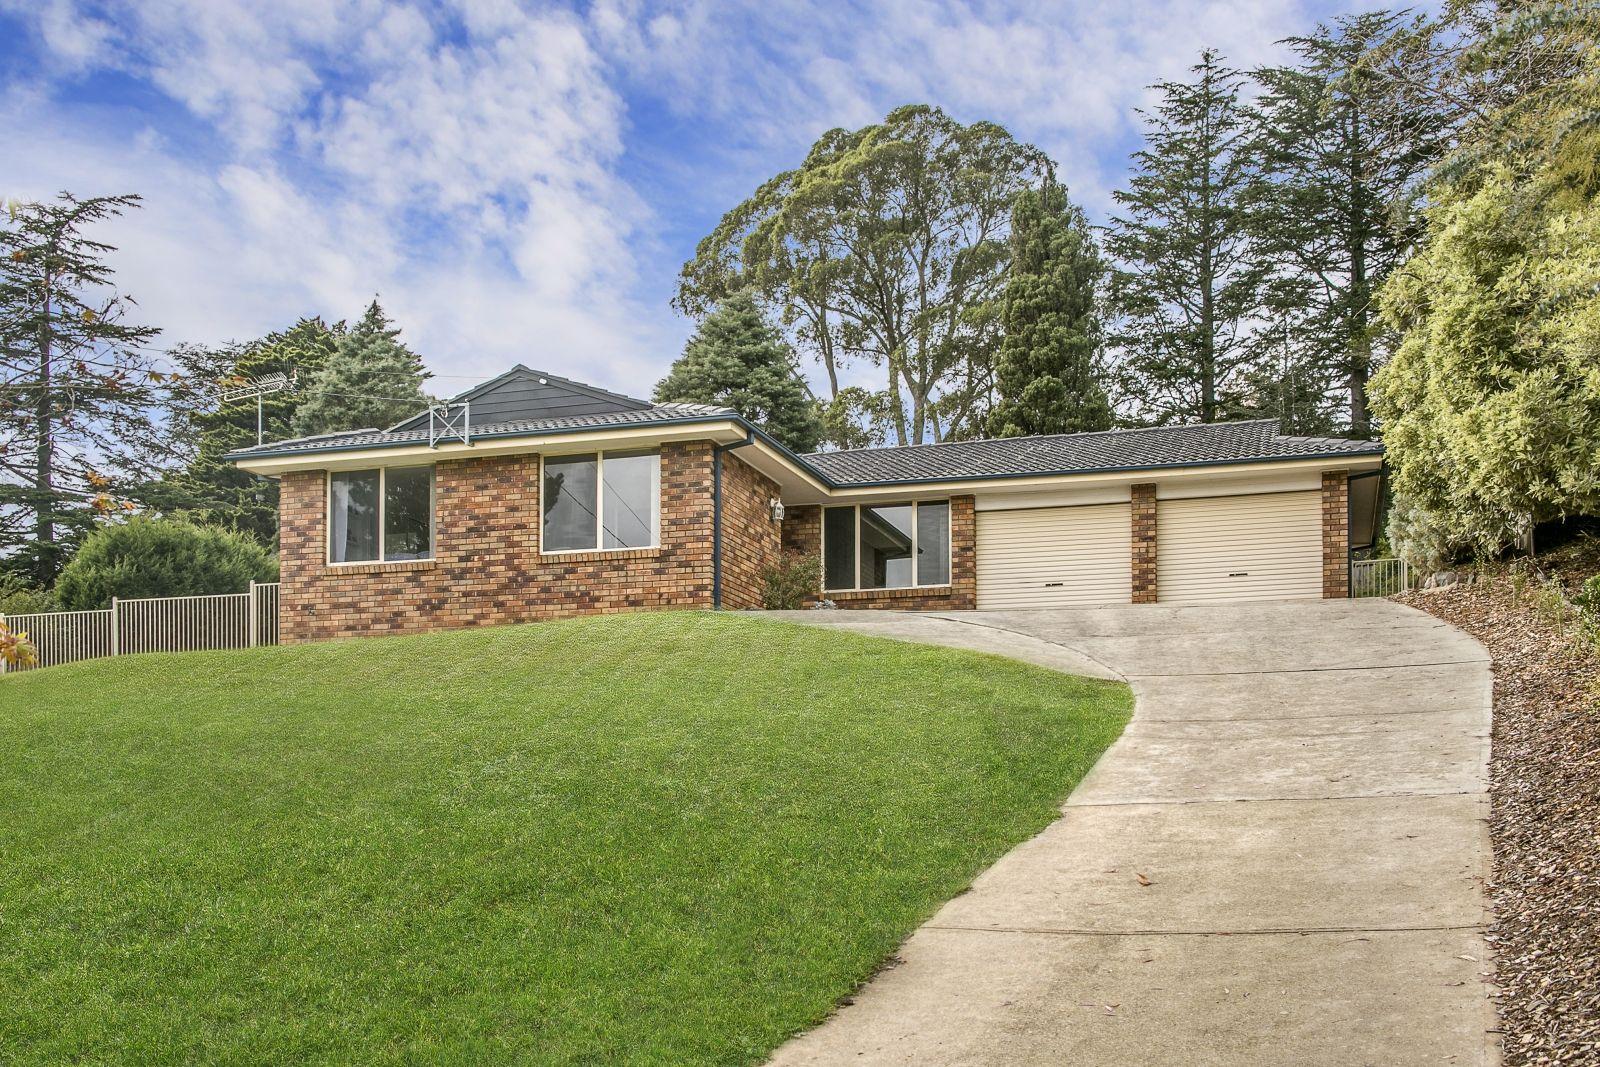 30 Semkin Street, Moss Vale NSW 2577, Image 0